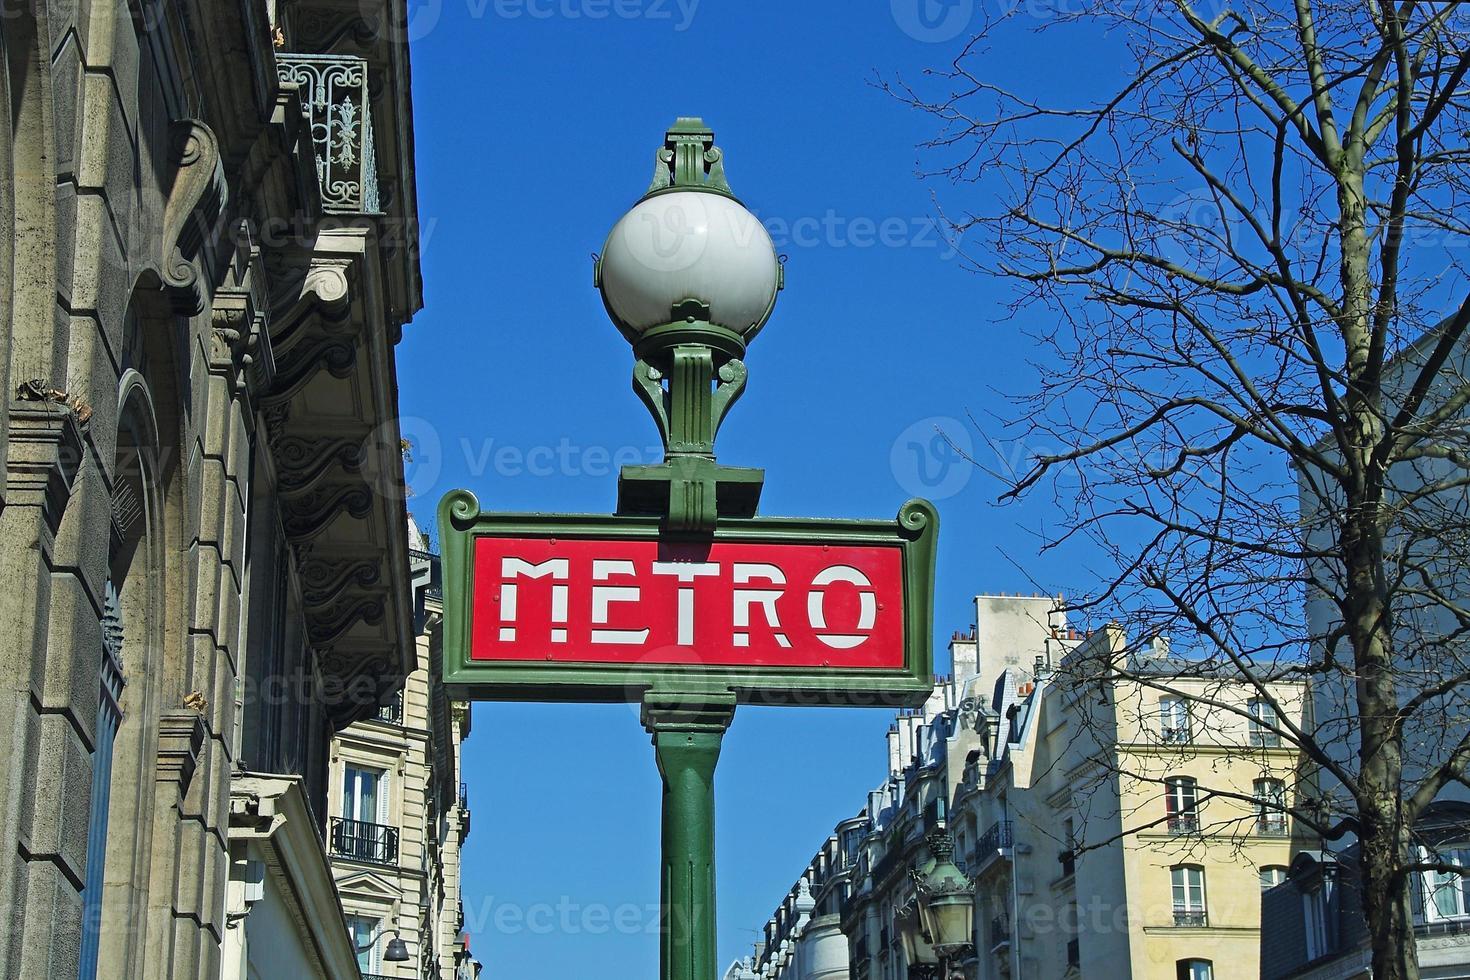 Metro sign on Paris street (close-up) photo